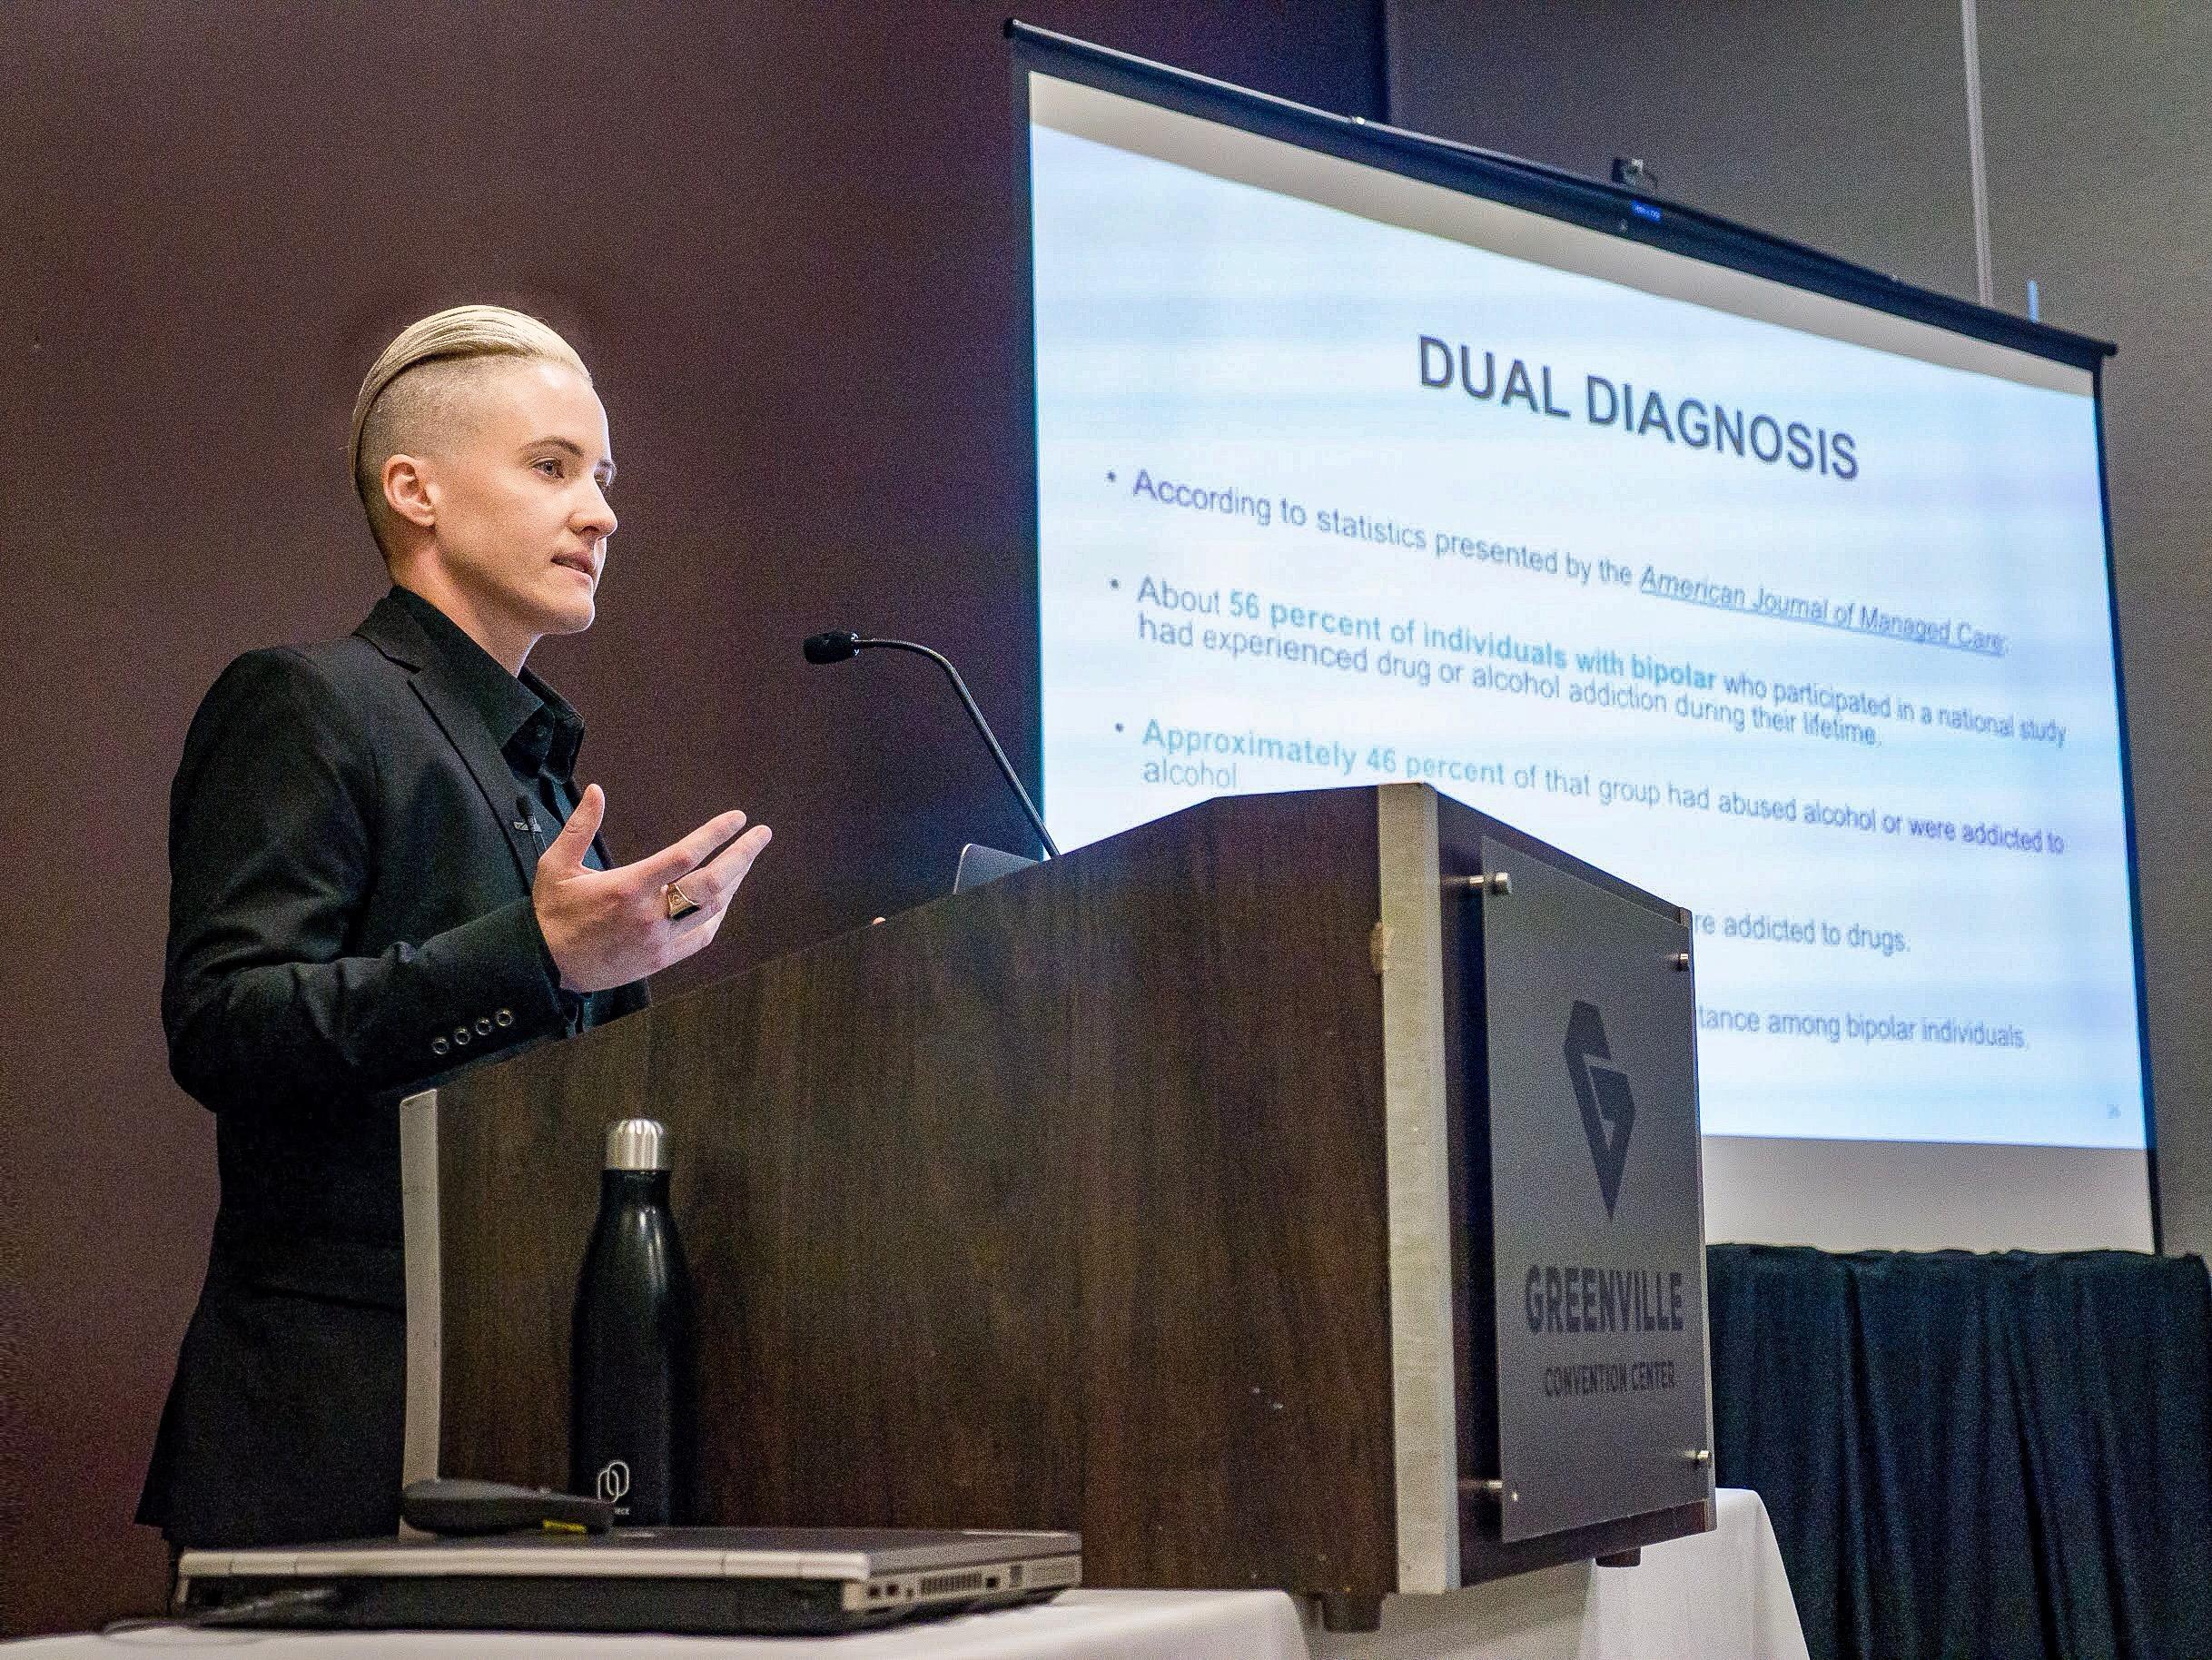 Torri Speaking at the Symposium on Mental Health 2019